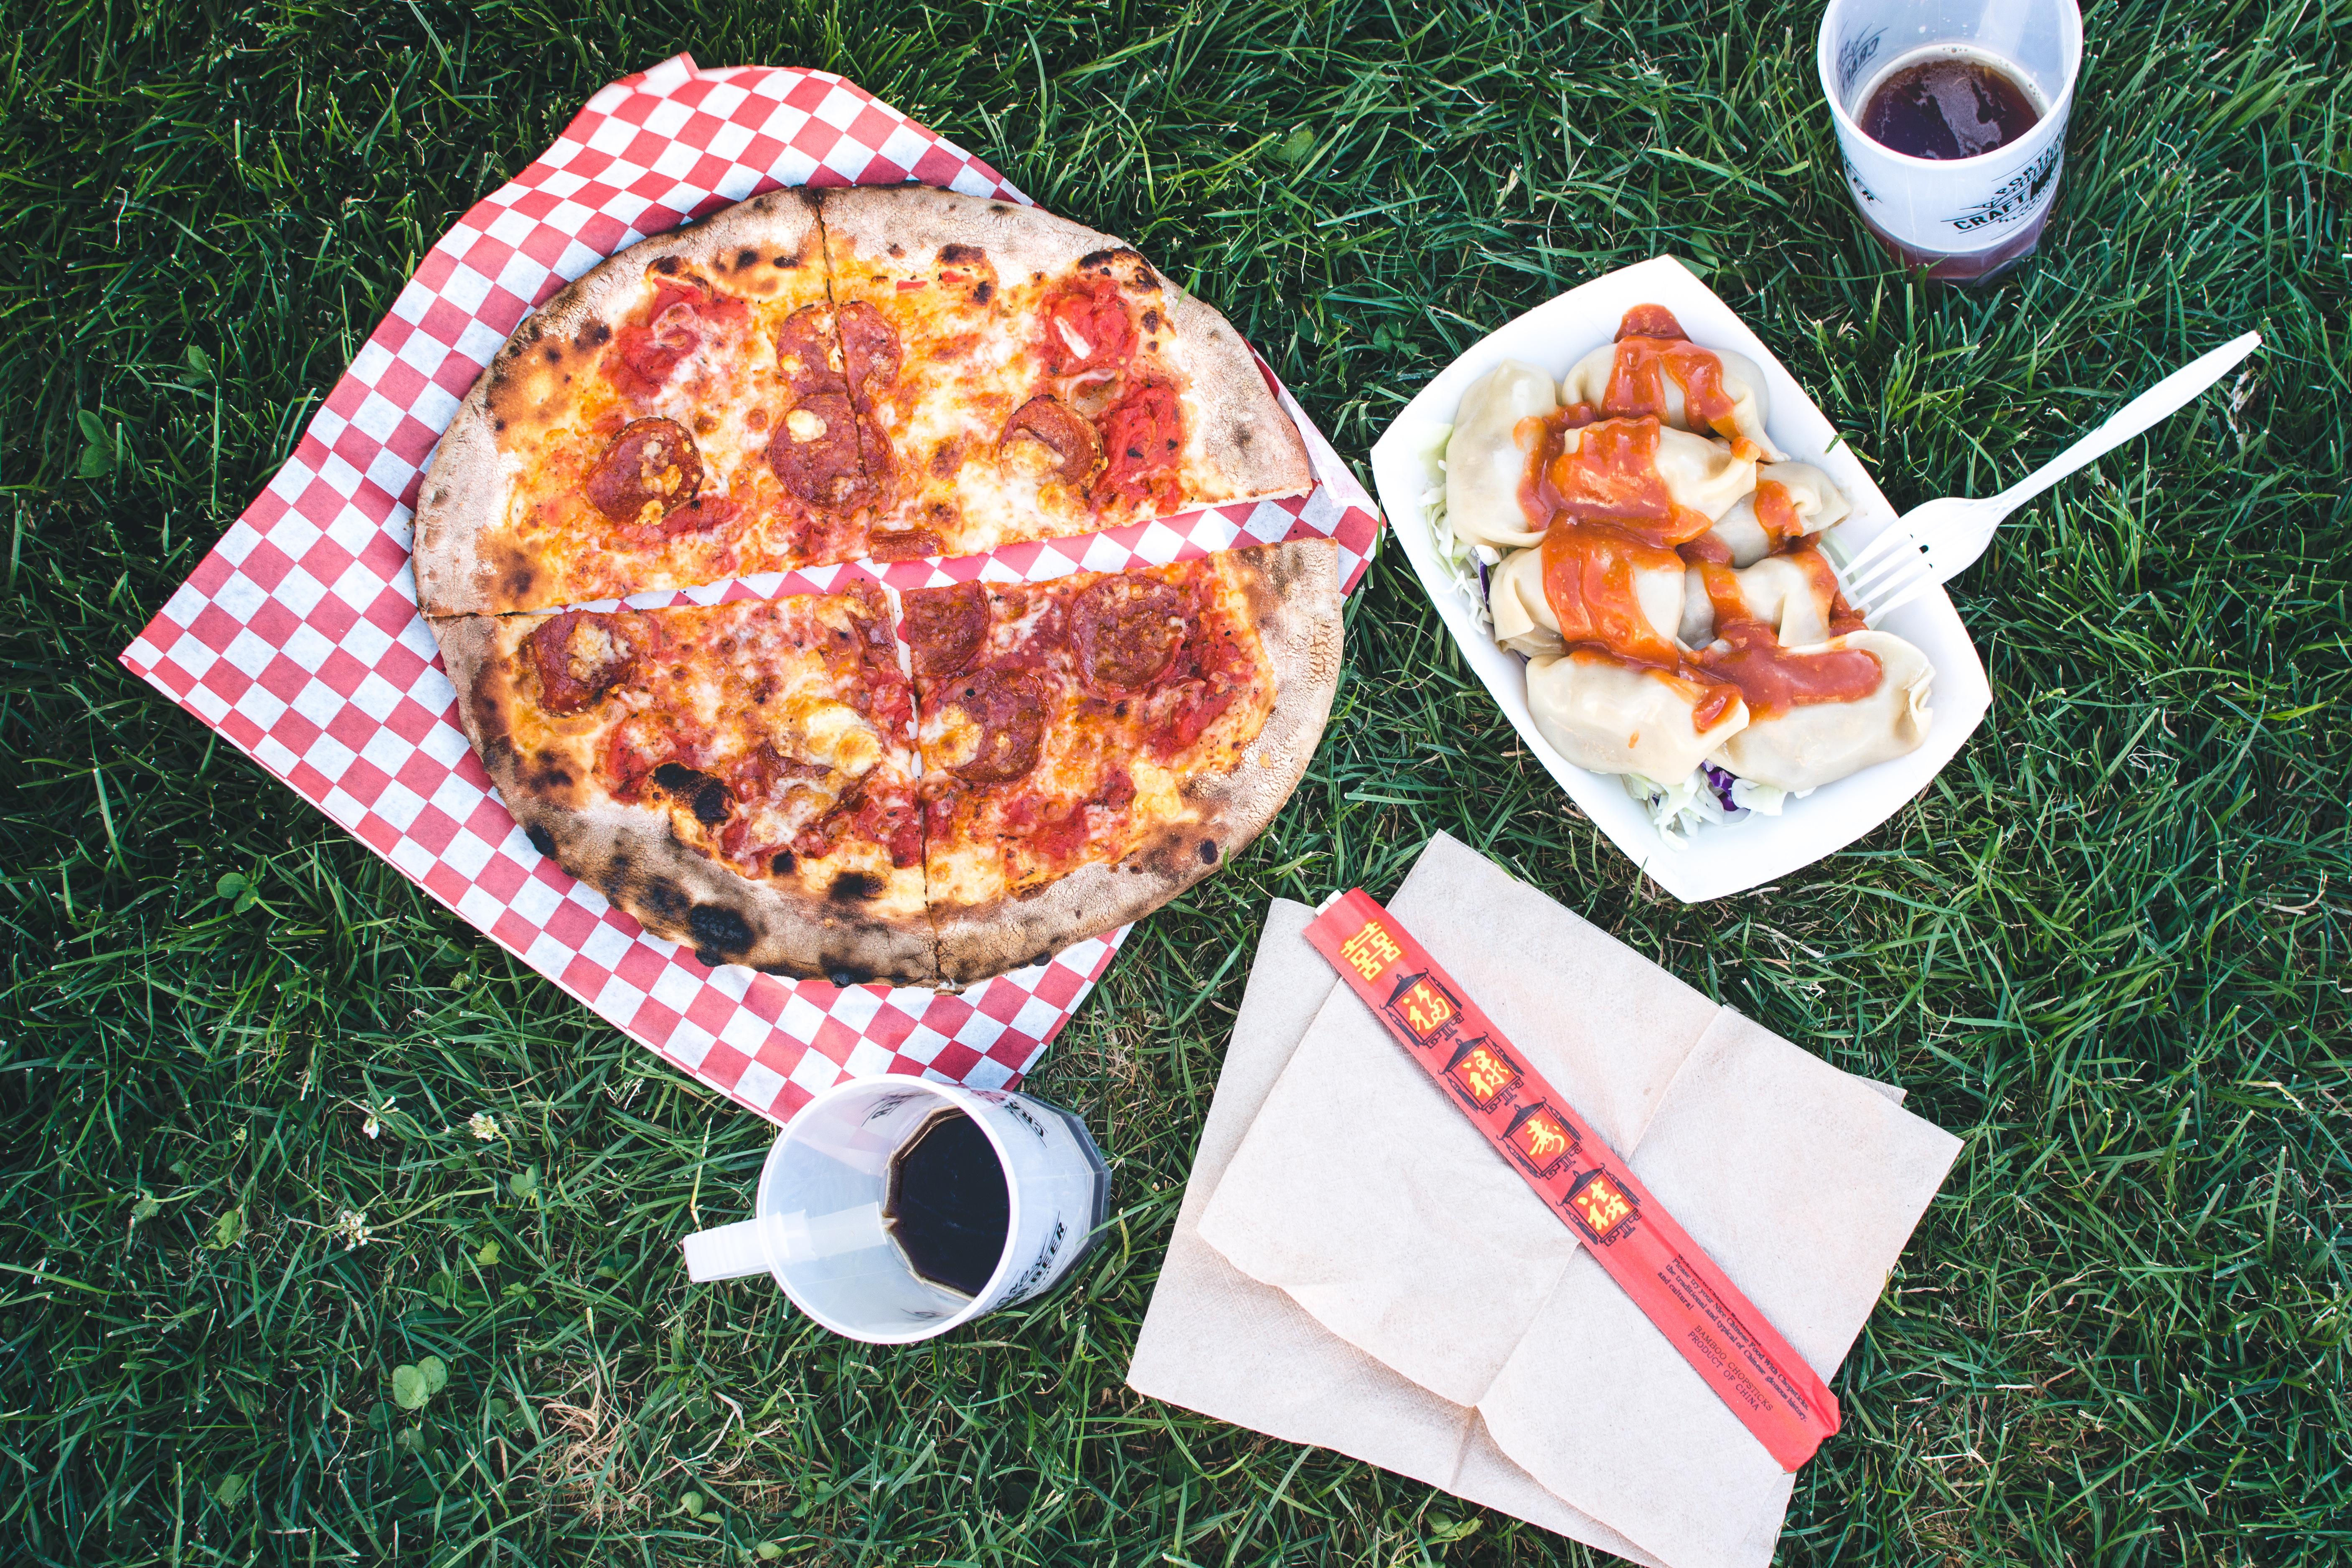 foodiesfeed.com_pizza-salami-and-korean-dumplings-mandu-on-a-grass